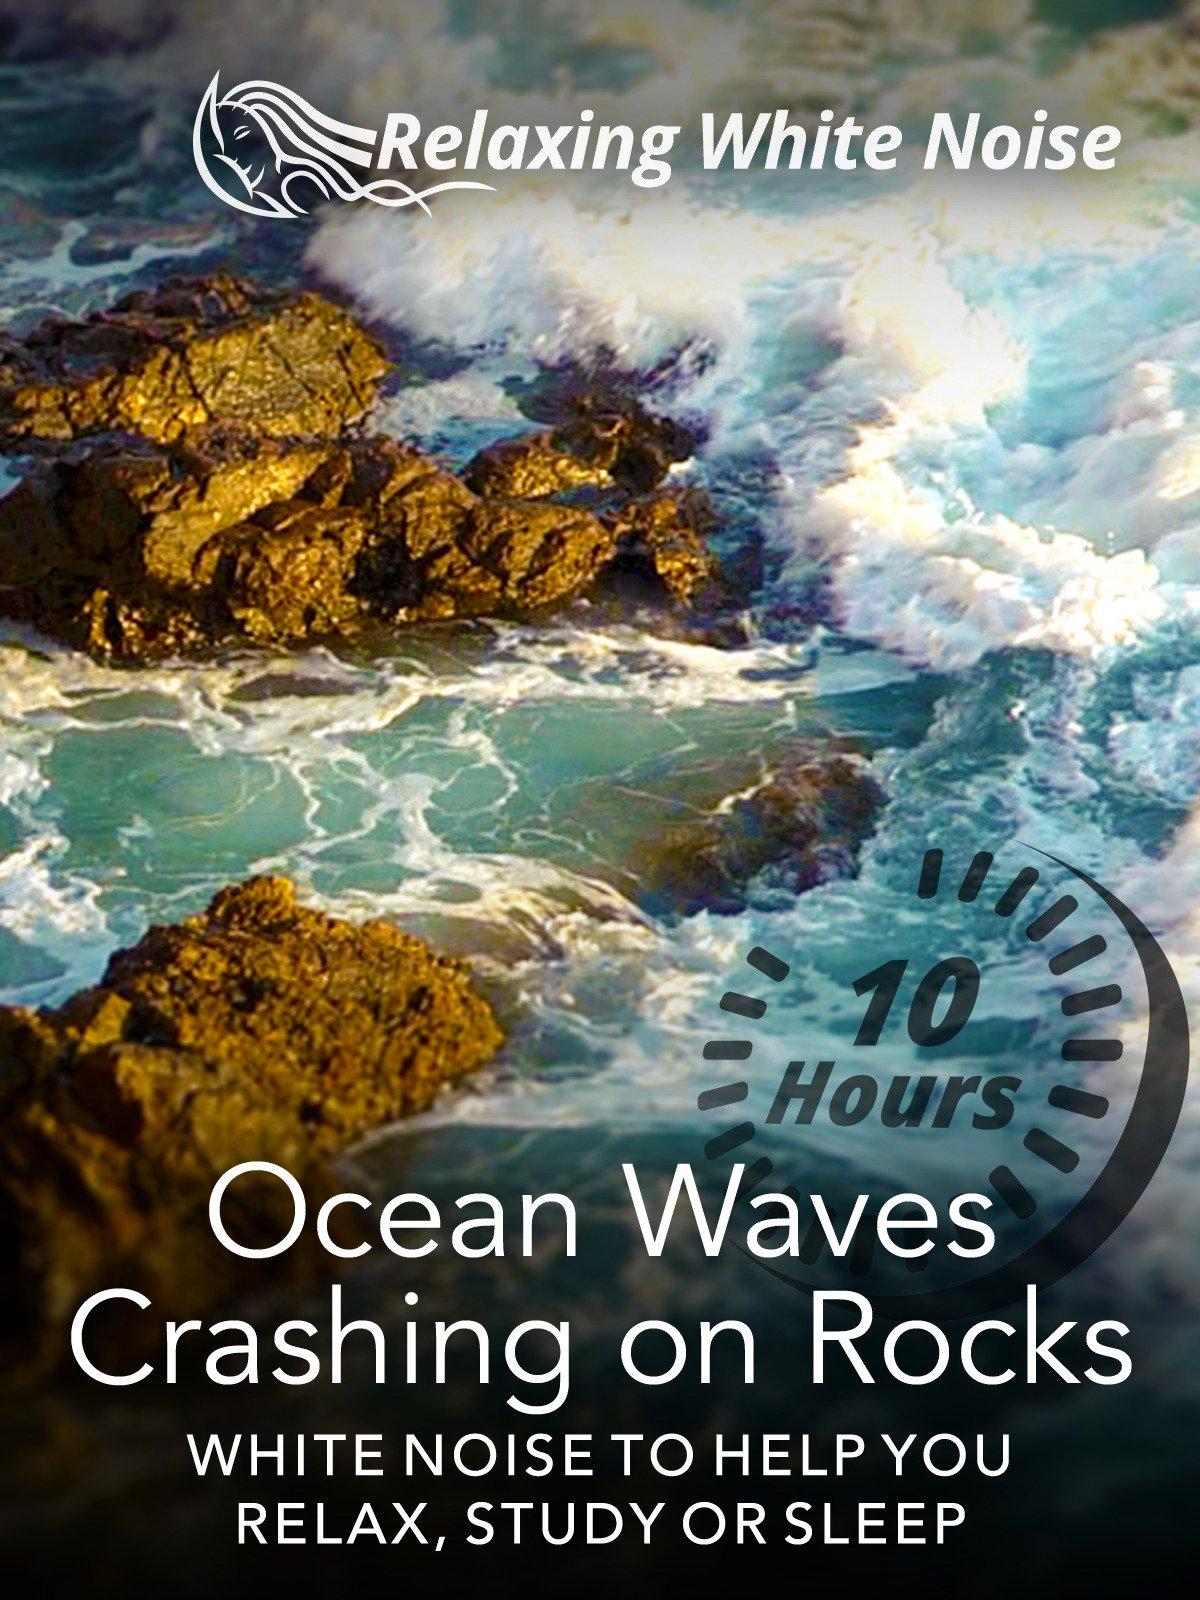 Ocean Waves Crashing on Rocks 10 Hours